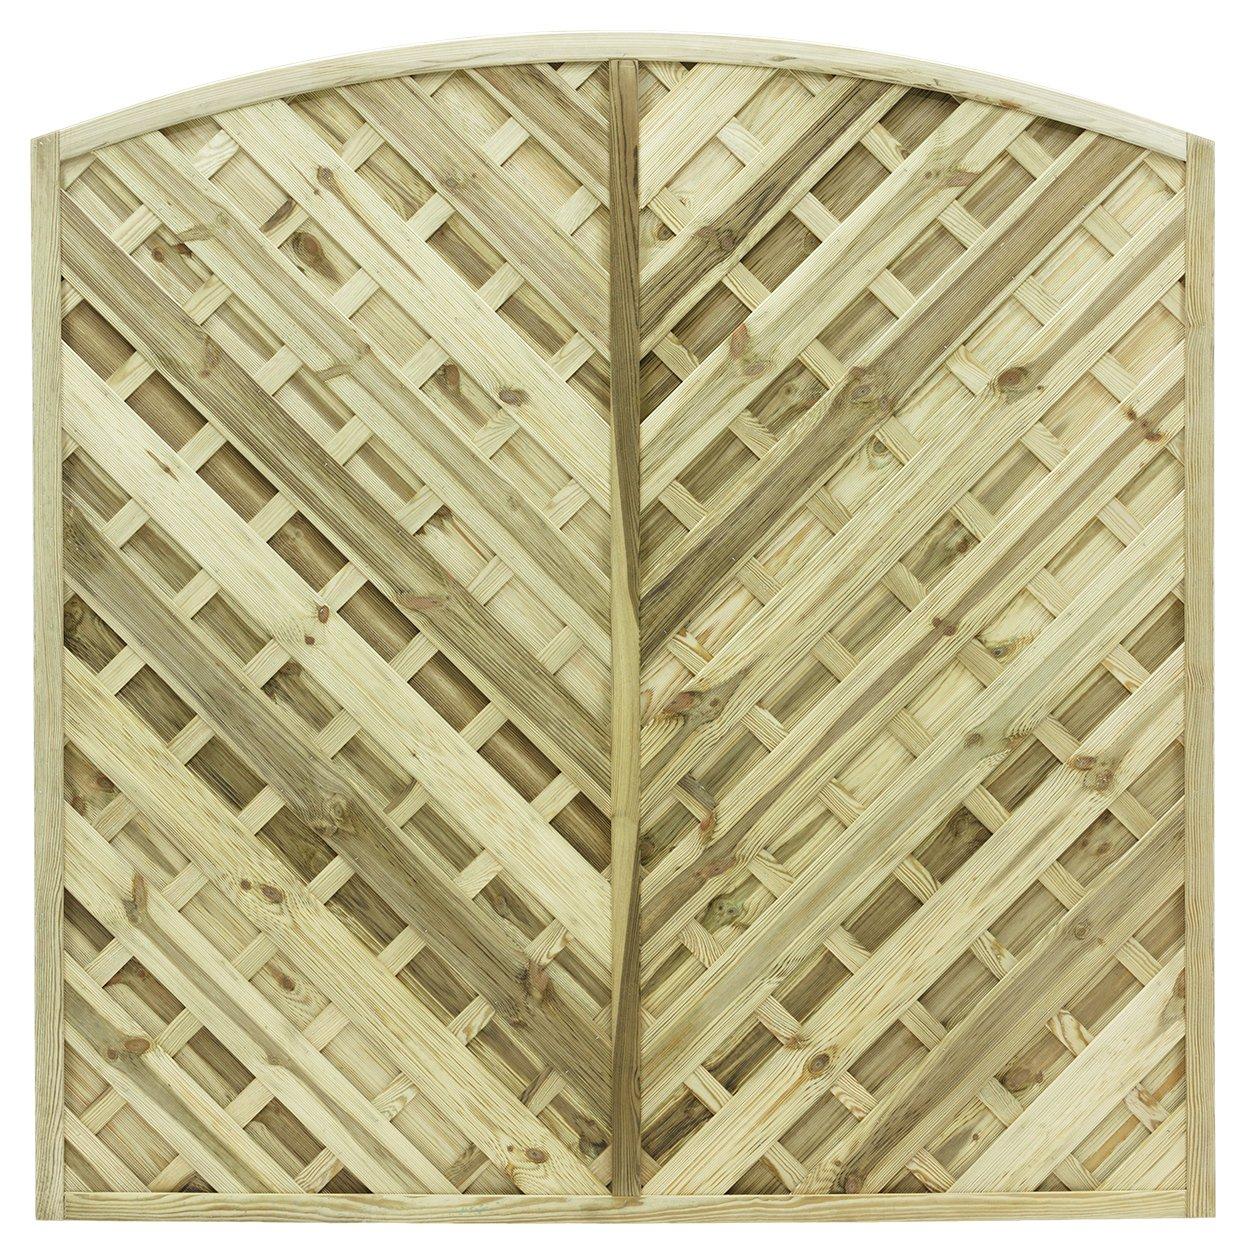 Grange Elite St Lunairs 1.8m Fence Panel - Pack of 5. lowest price